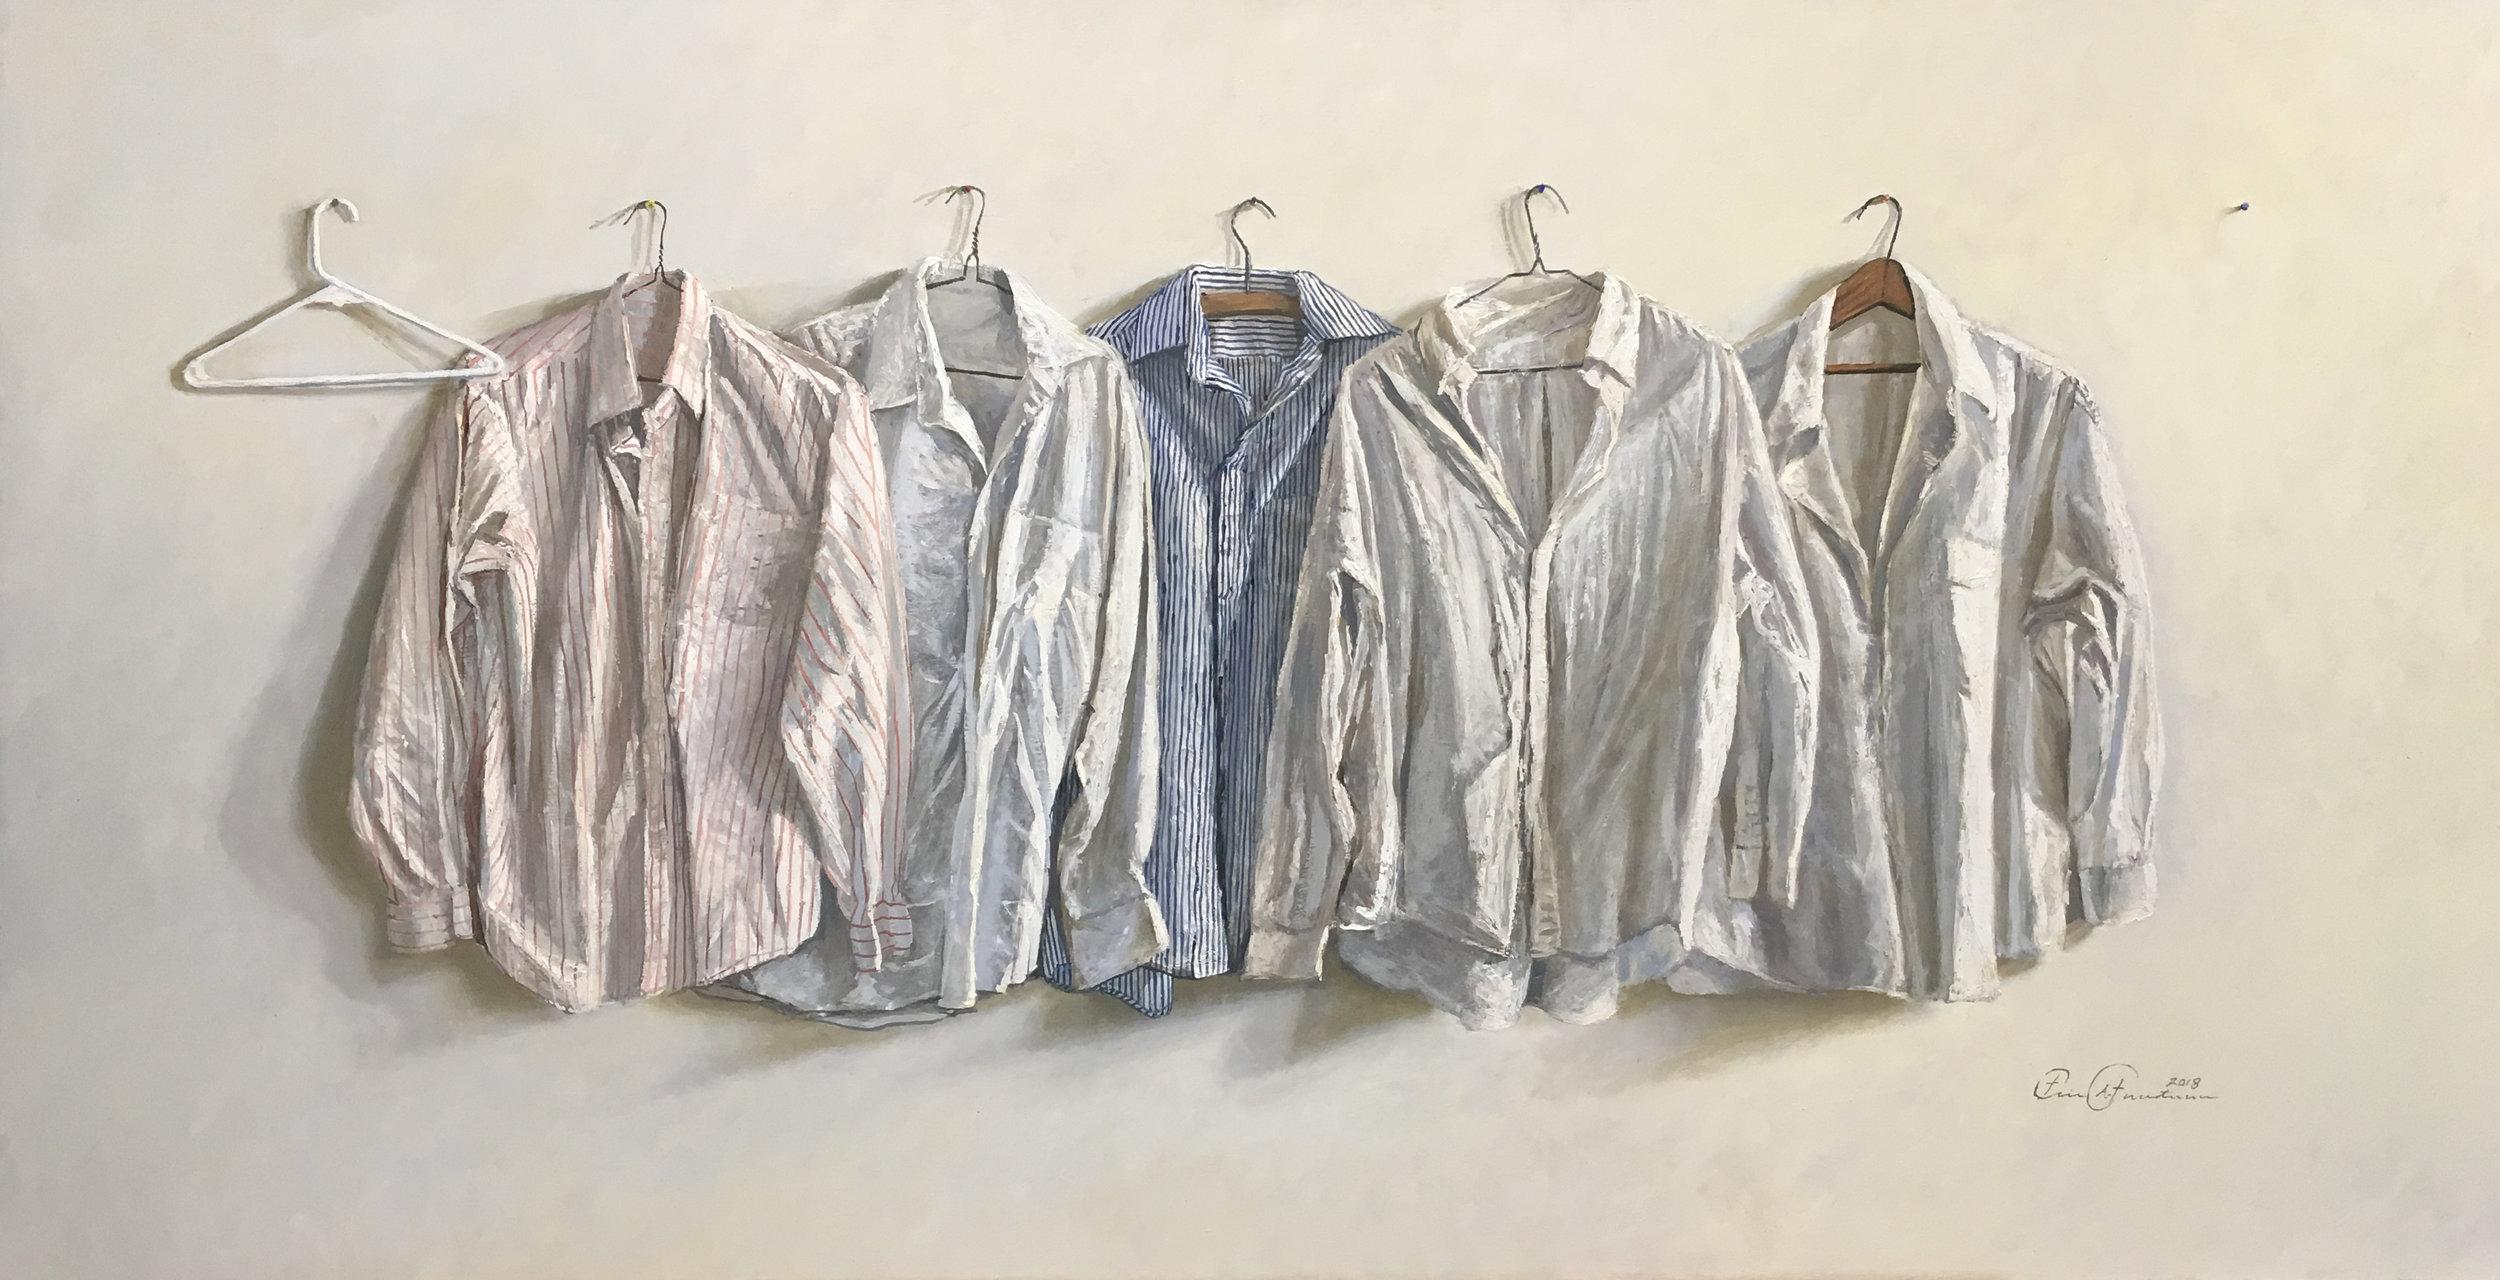 Eric Forstmann. Pale Shirts.